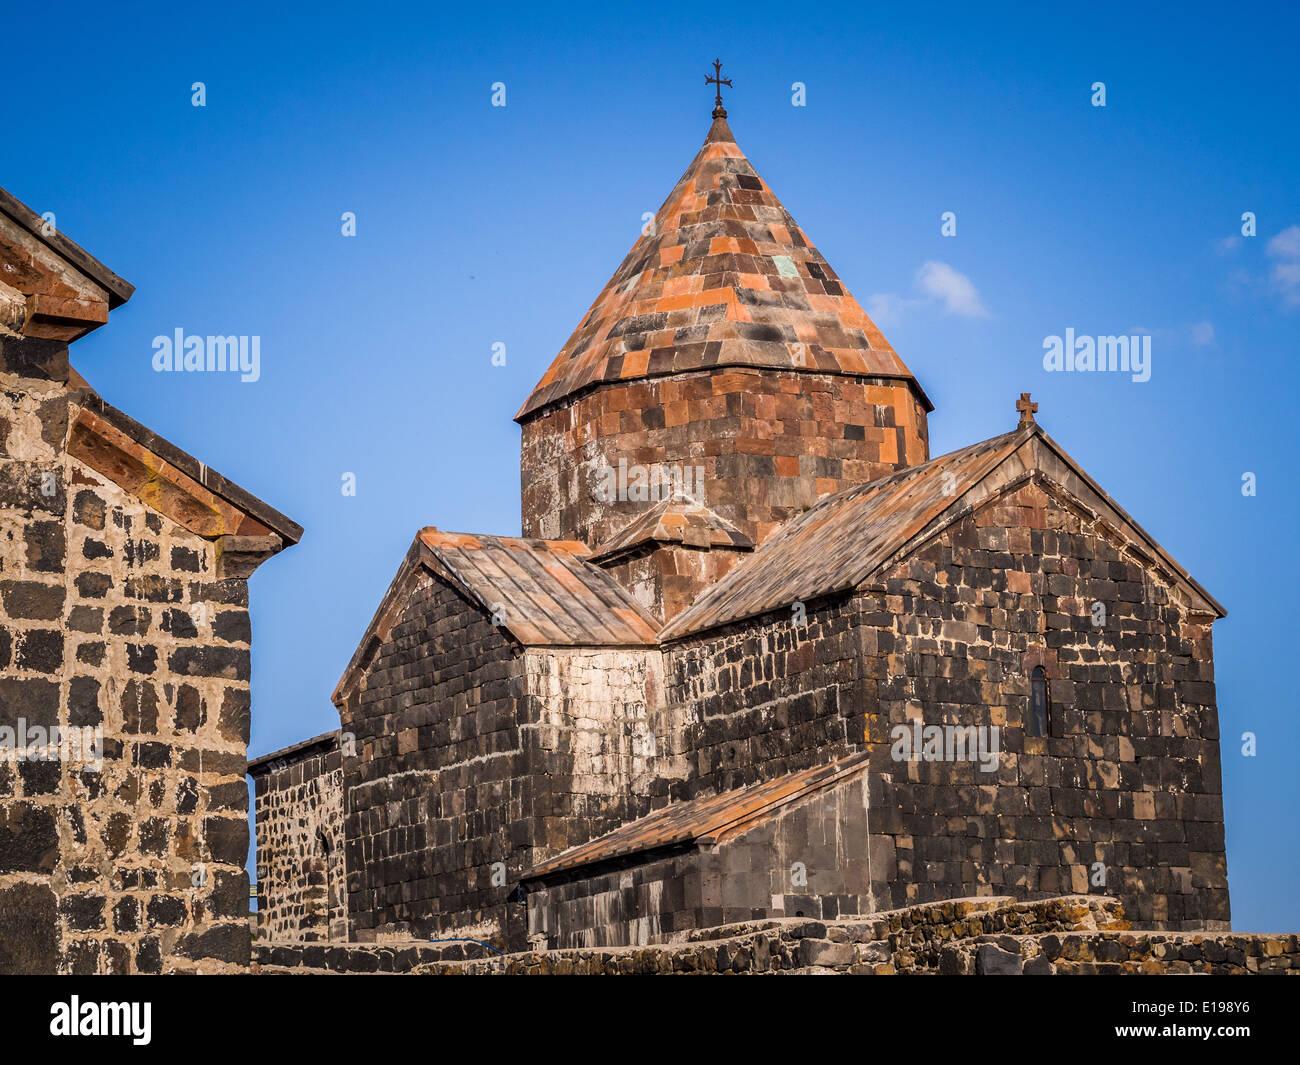 Sevanavank monastic complex in Armenia. - Stock Image